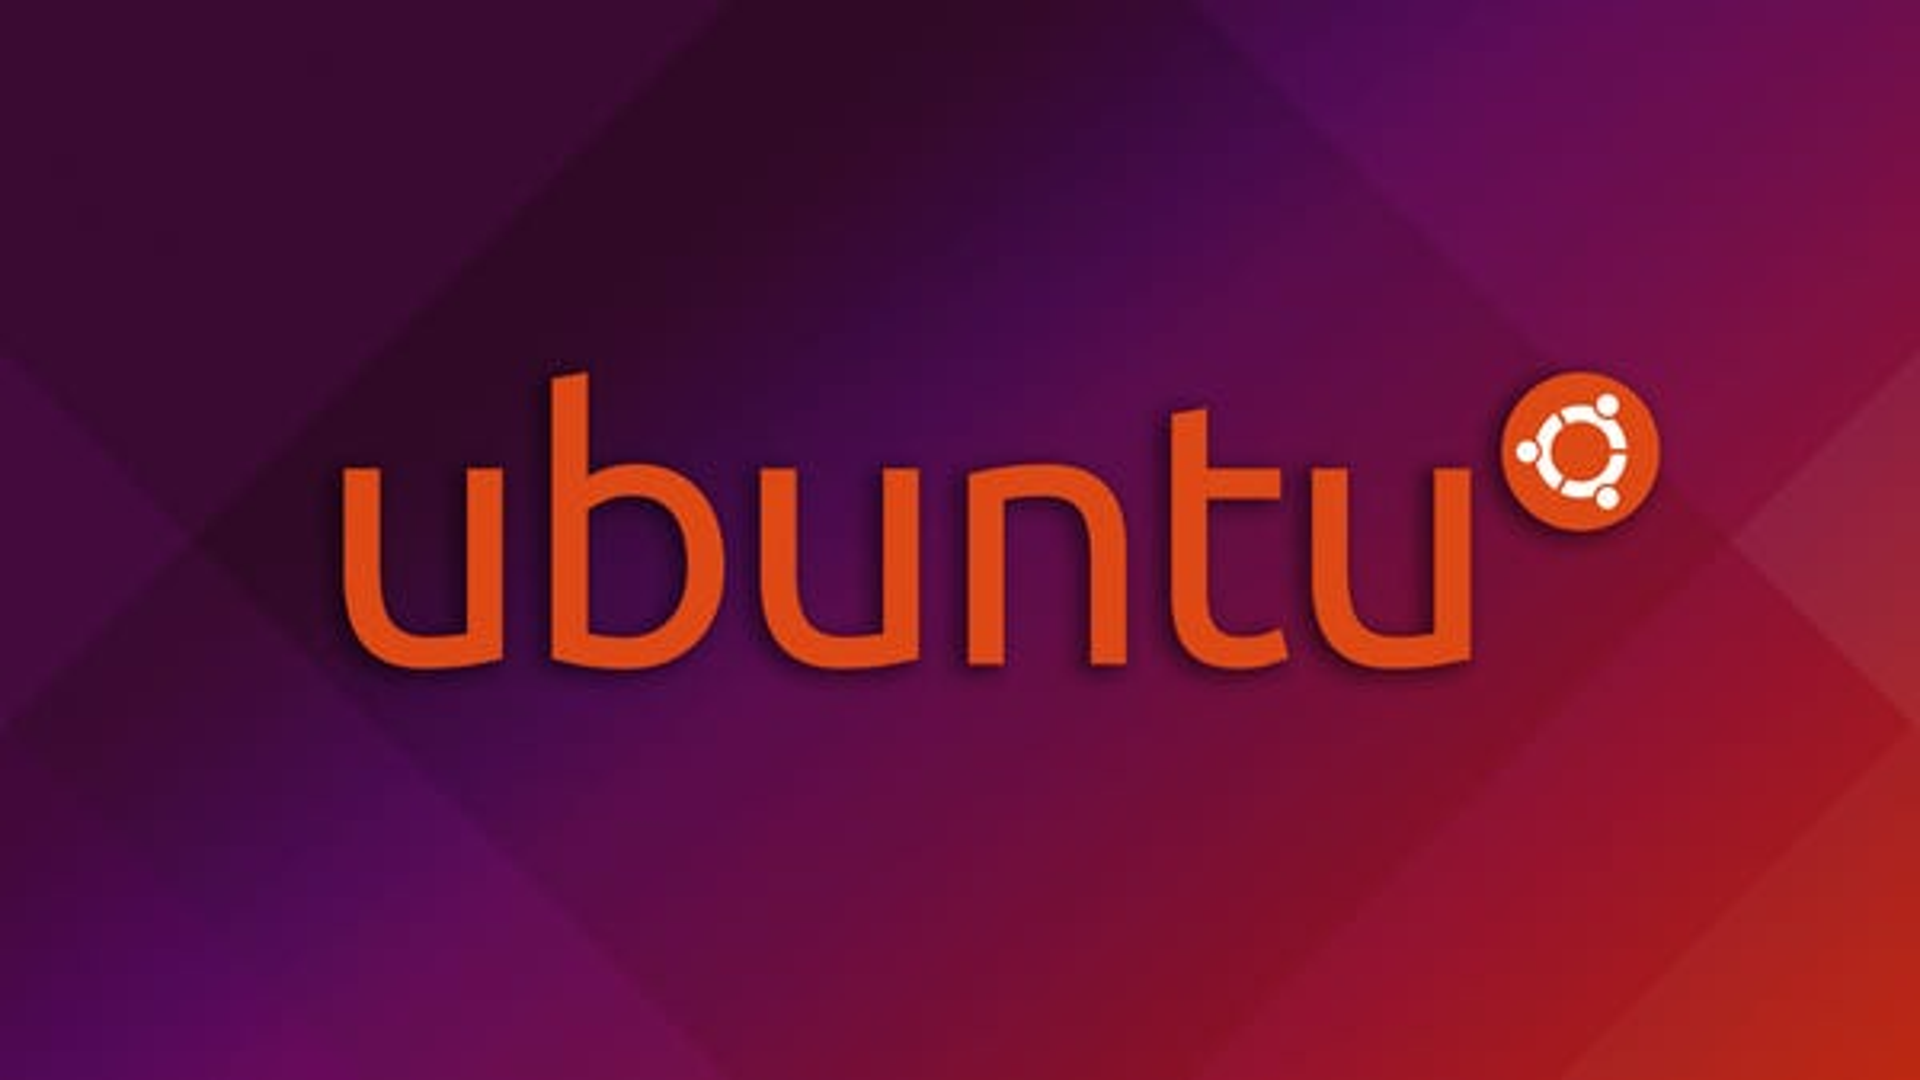 Ubuntu 21.10 Arrives With a Customized GNOME 40 Desktop